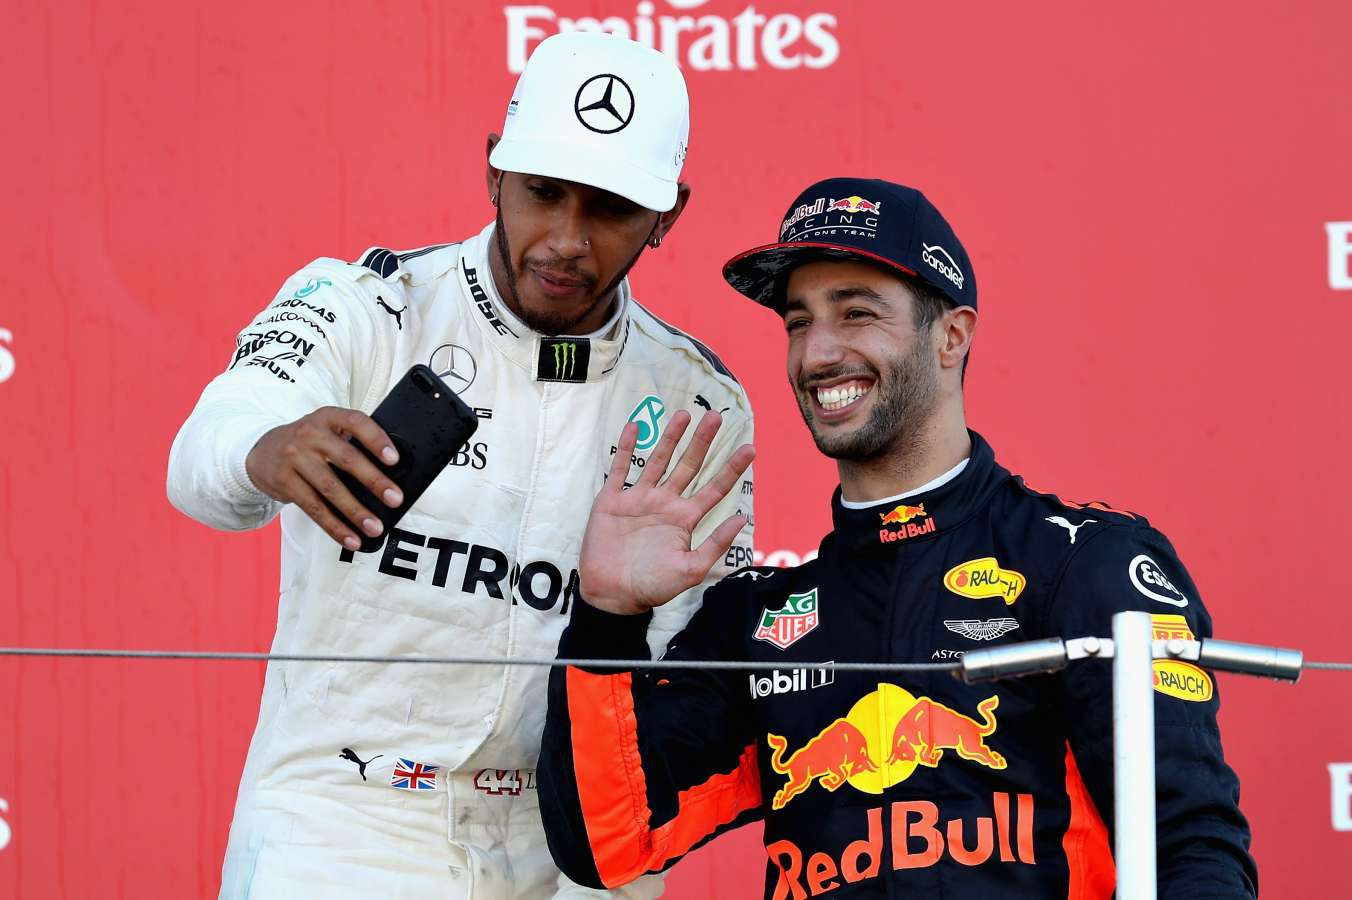 Lewis Hamilton v Daniel Ricciardo - An Albert Park rivalry